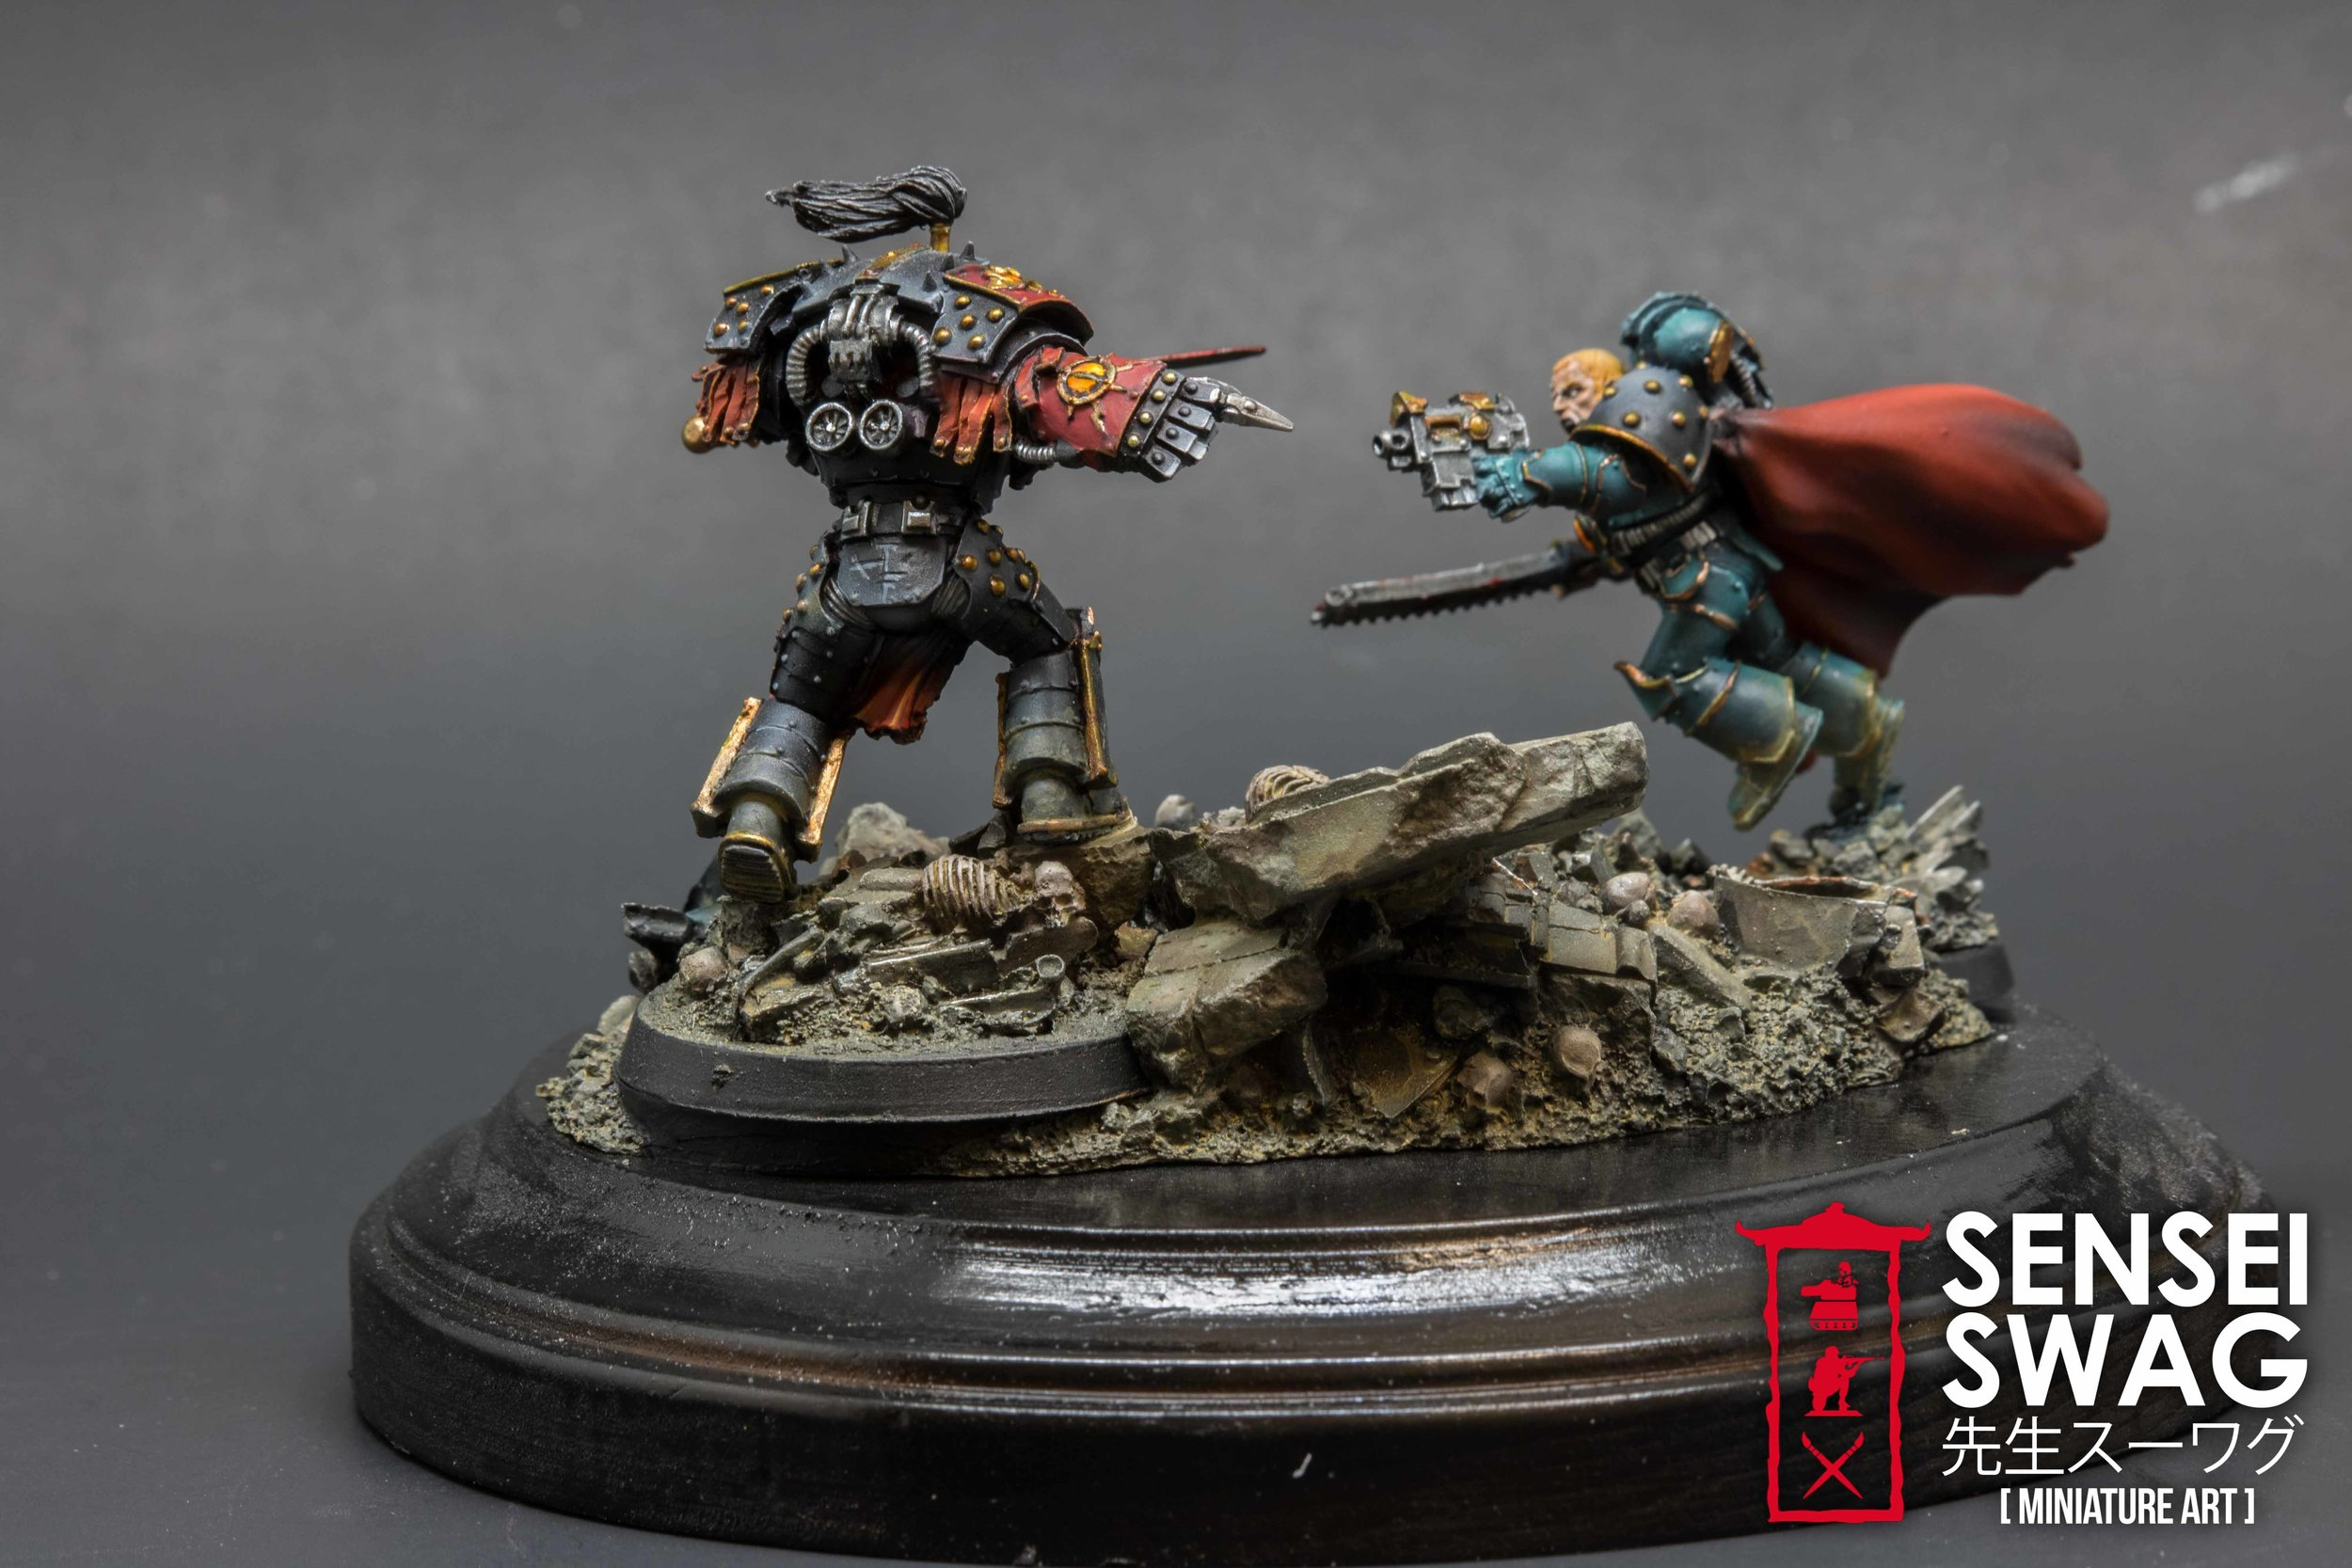 Abaddon vs Loken 30k Forgeworld Horus Heresy 40k Warhammer diorama Character Series (4 of 4).jpg